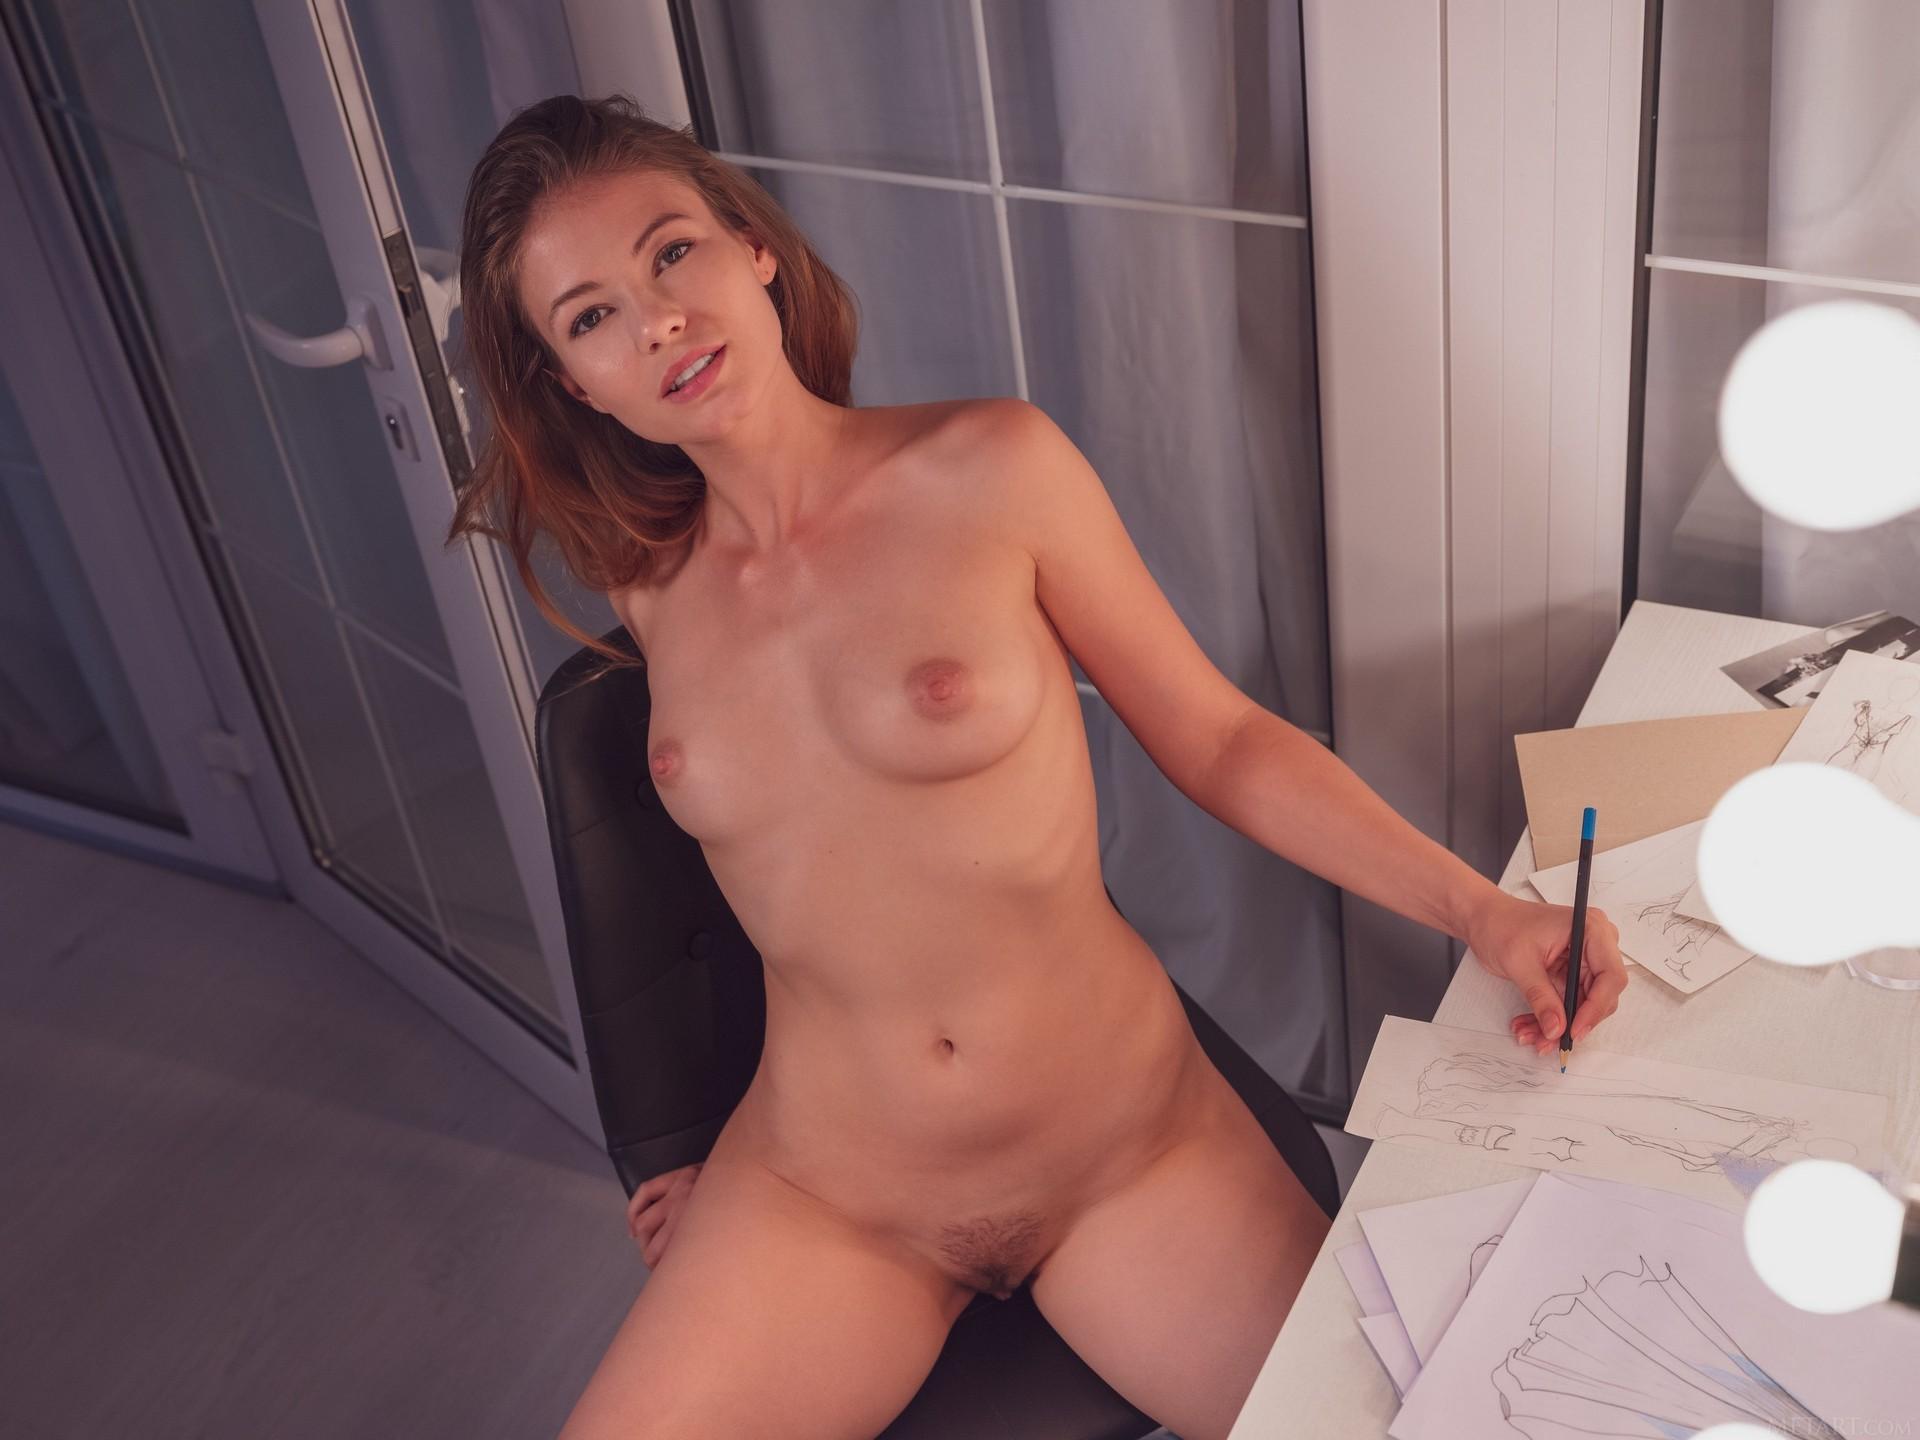 Hilary C In Sketching Playboy Plus (65)